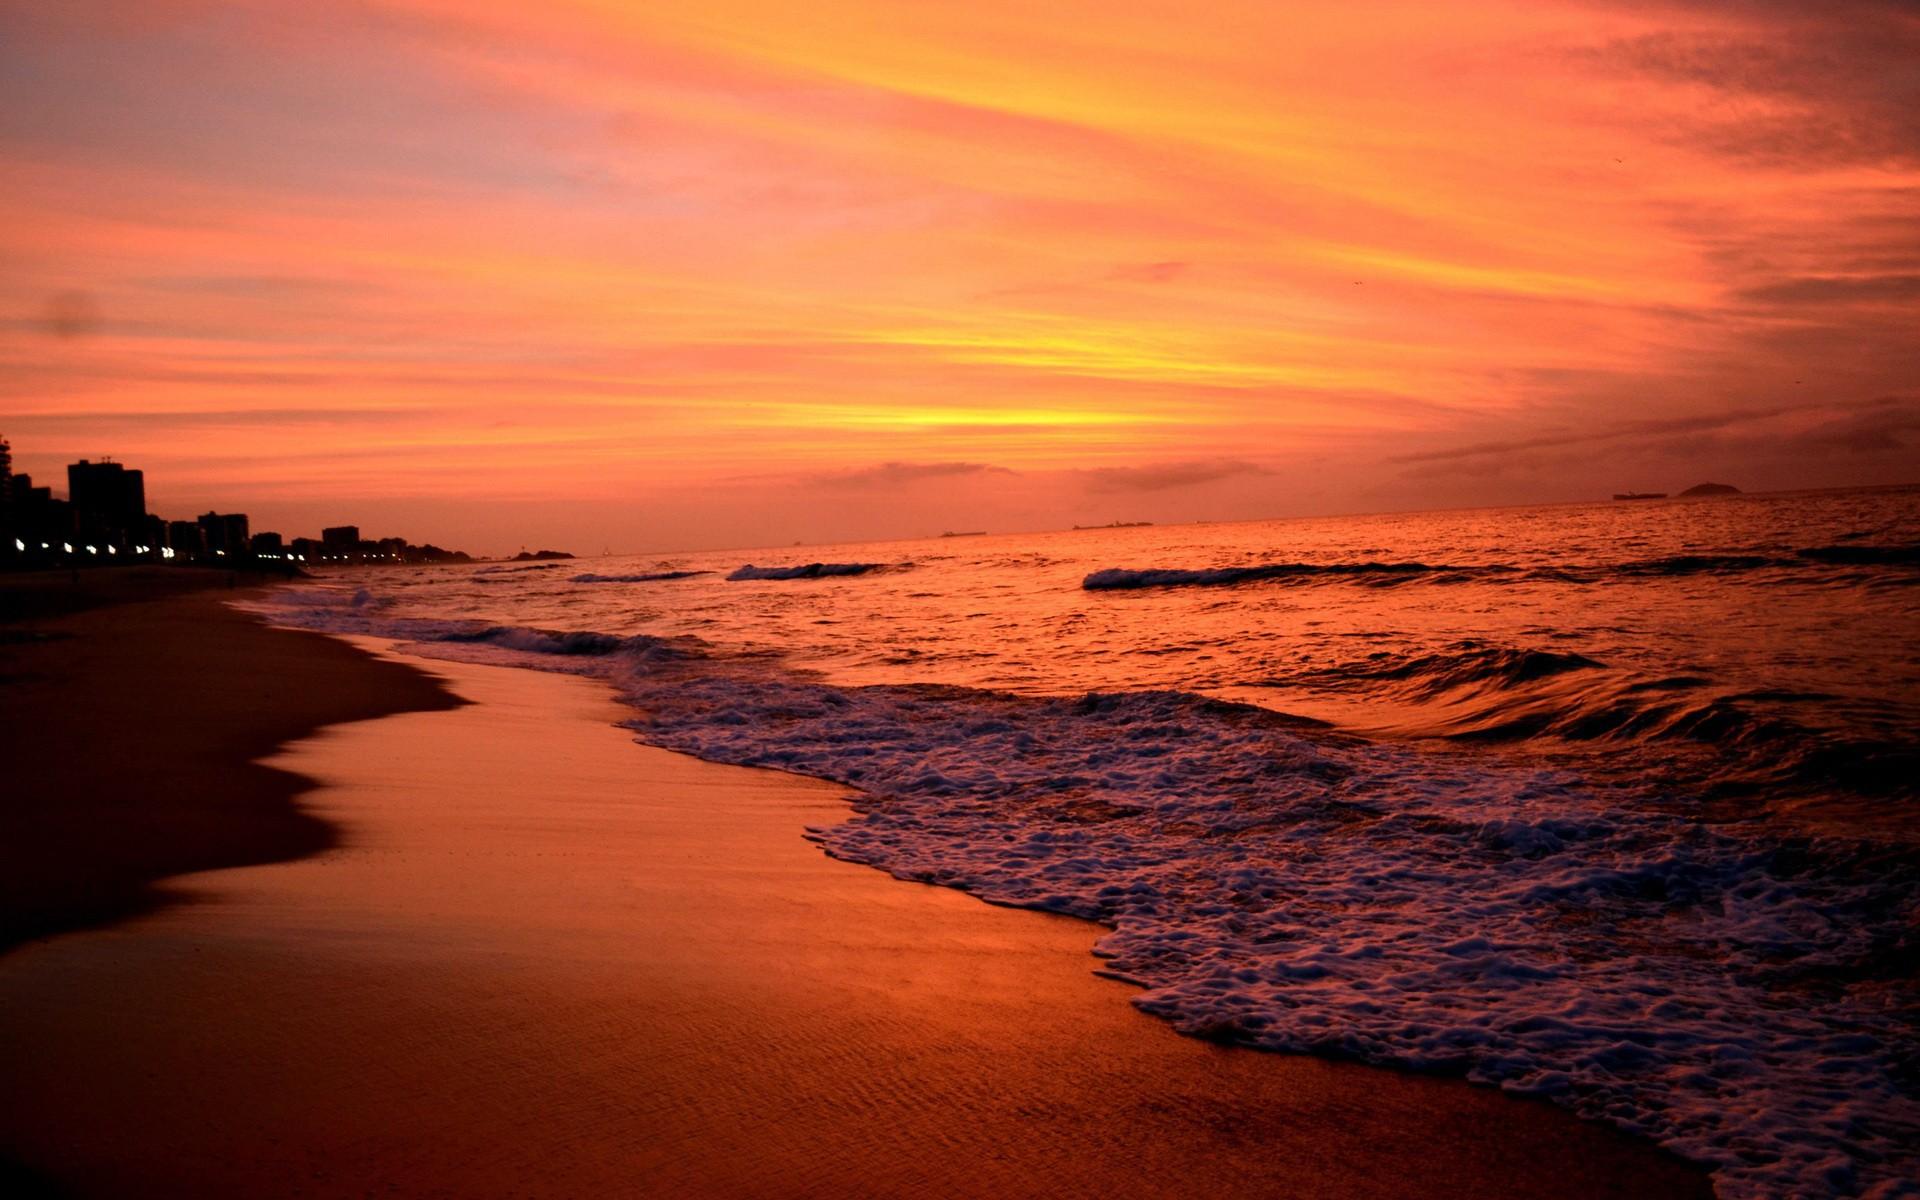 картинки закат на берегу моря десантники